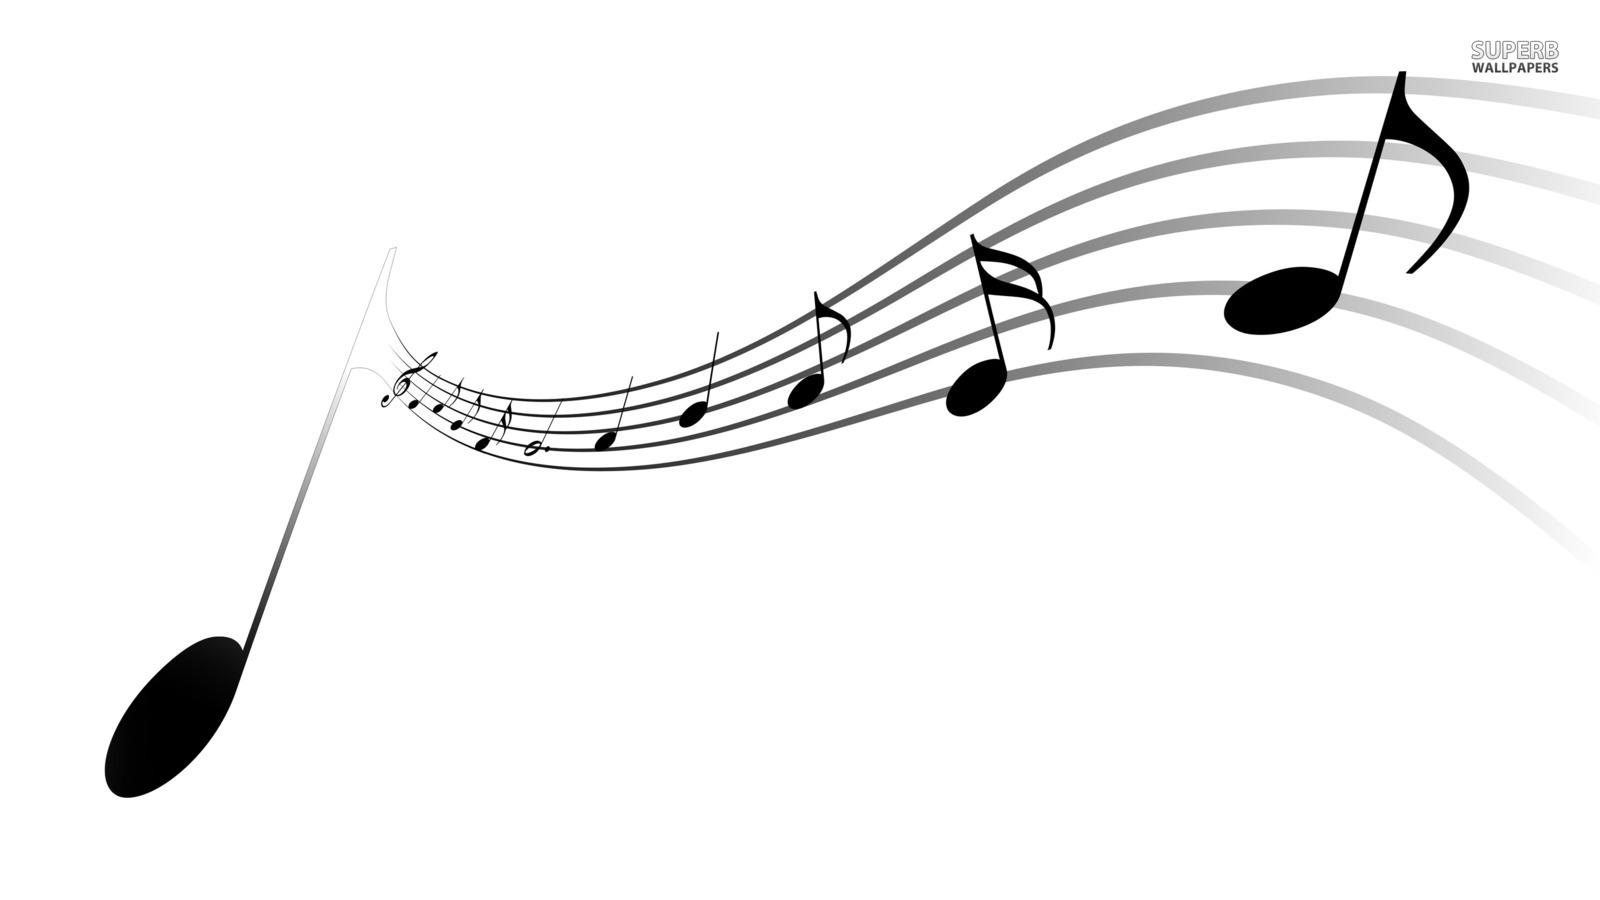 Music-classical-music-38720039-1600-900.jpg